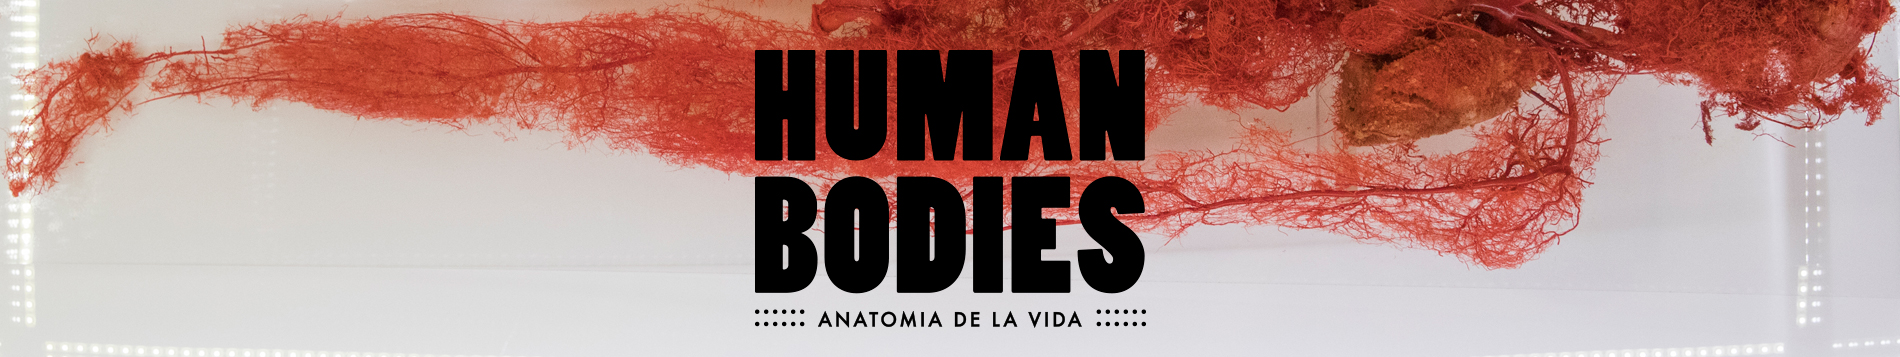 Human Bodies en Barcelona